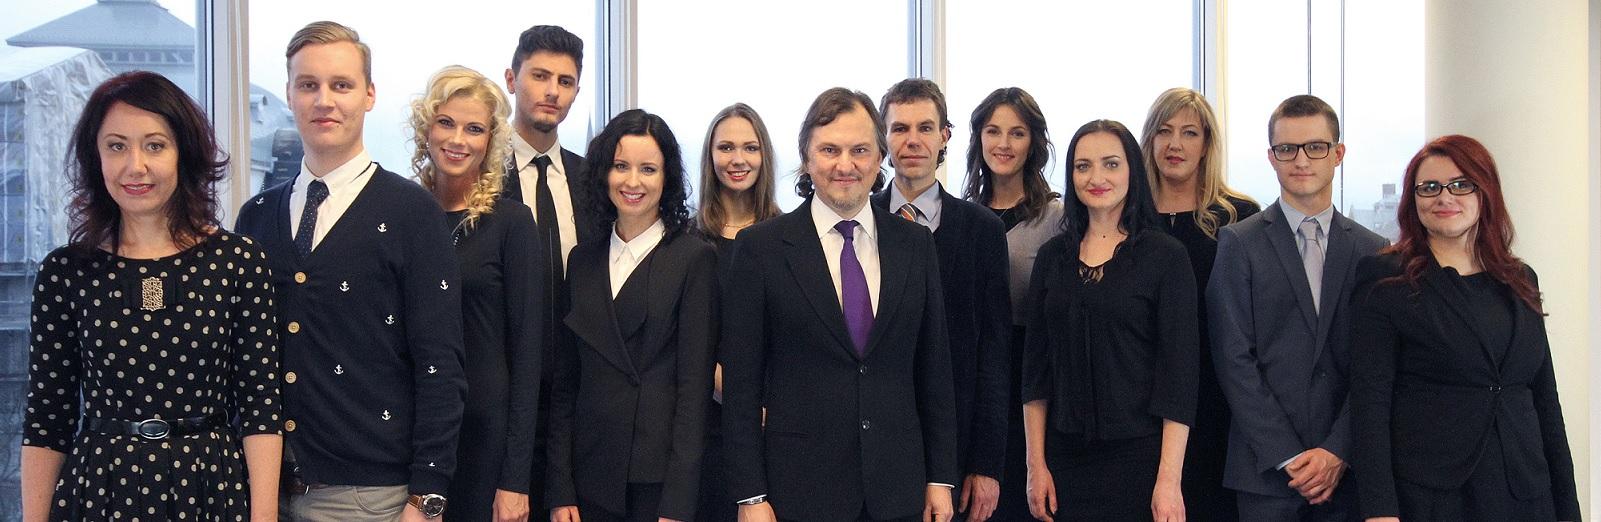 Gencs Team